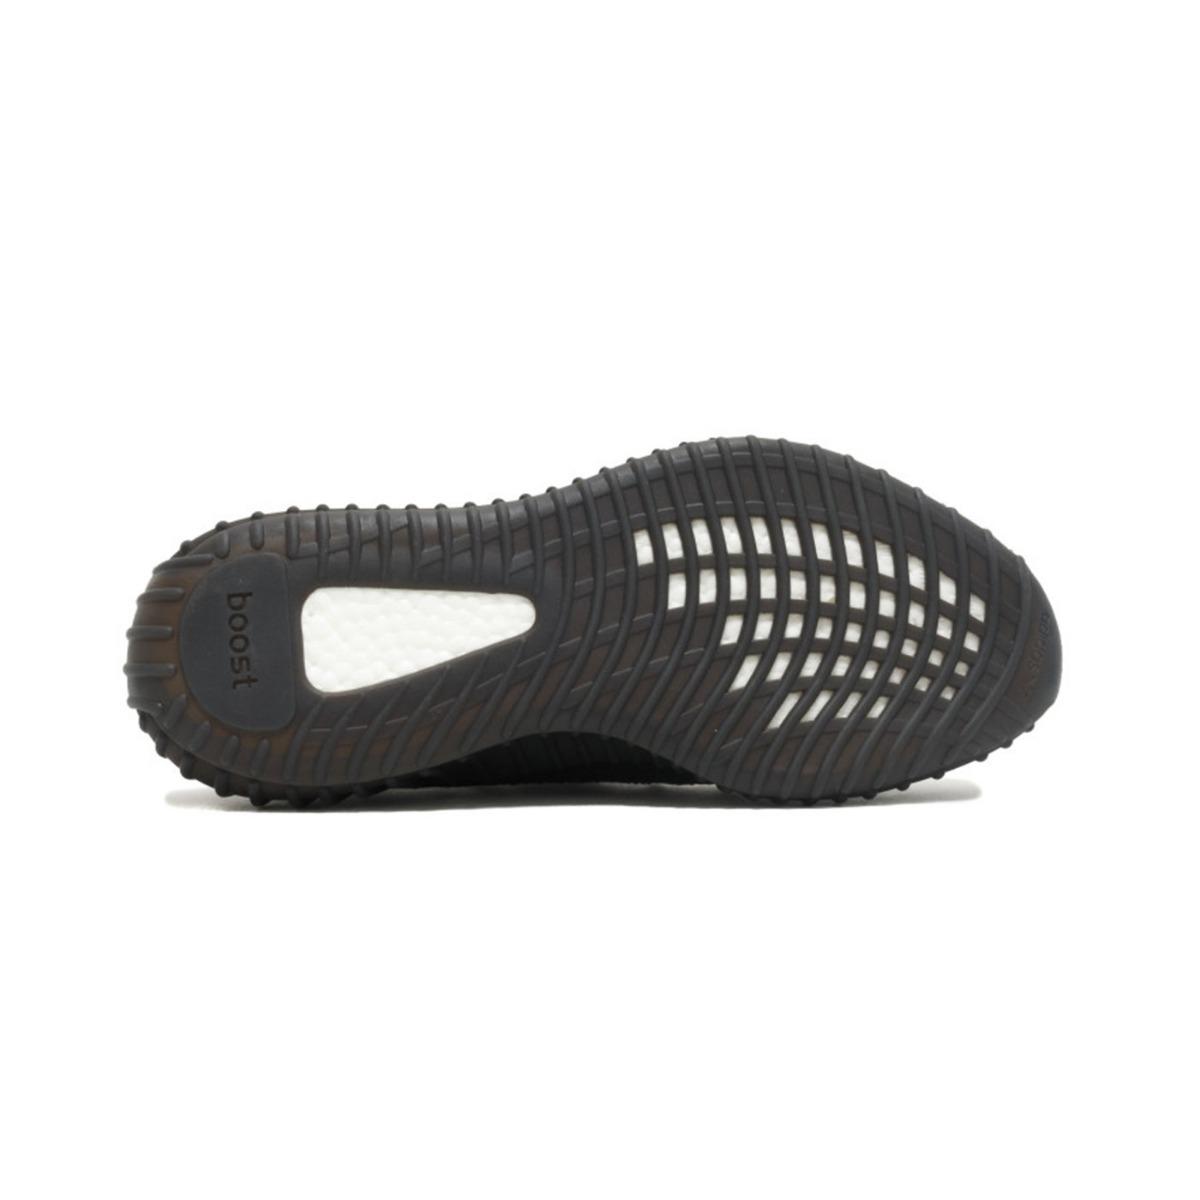 purchase cheap 40a23 716e6 adidas yeezy boost 350 v2 black orange dama. Cargando zoom.